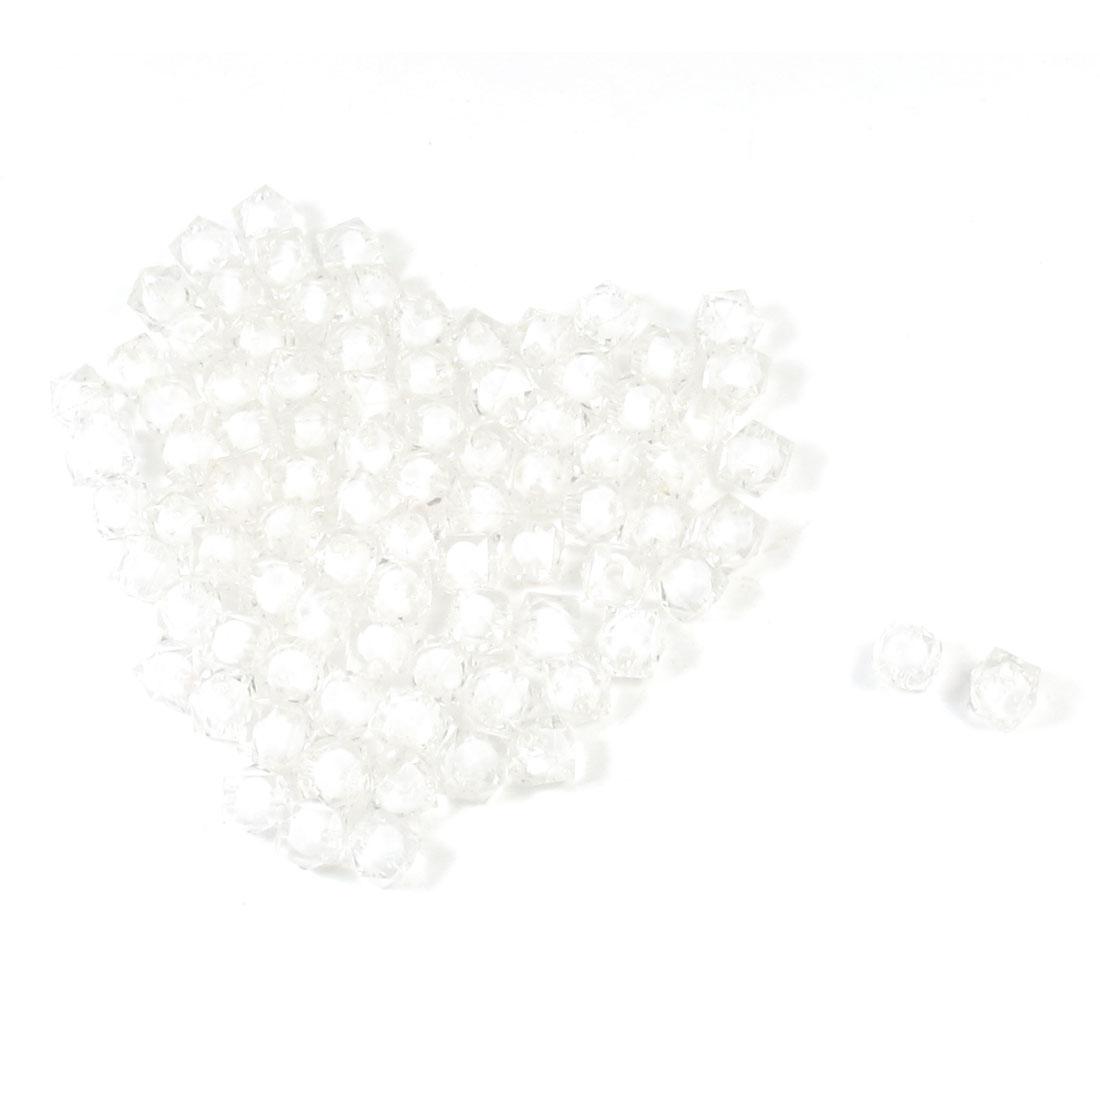 88x Necklace Bracelet Decor Clear White Square Shape Plastic Faceted Beads